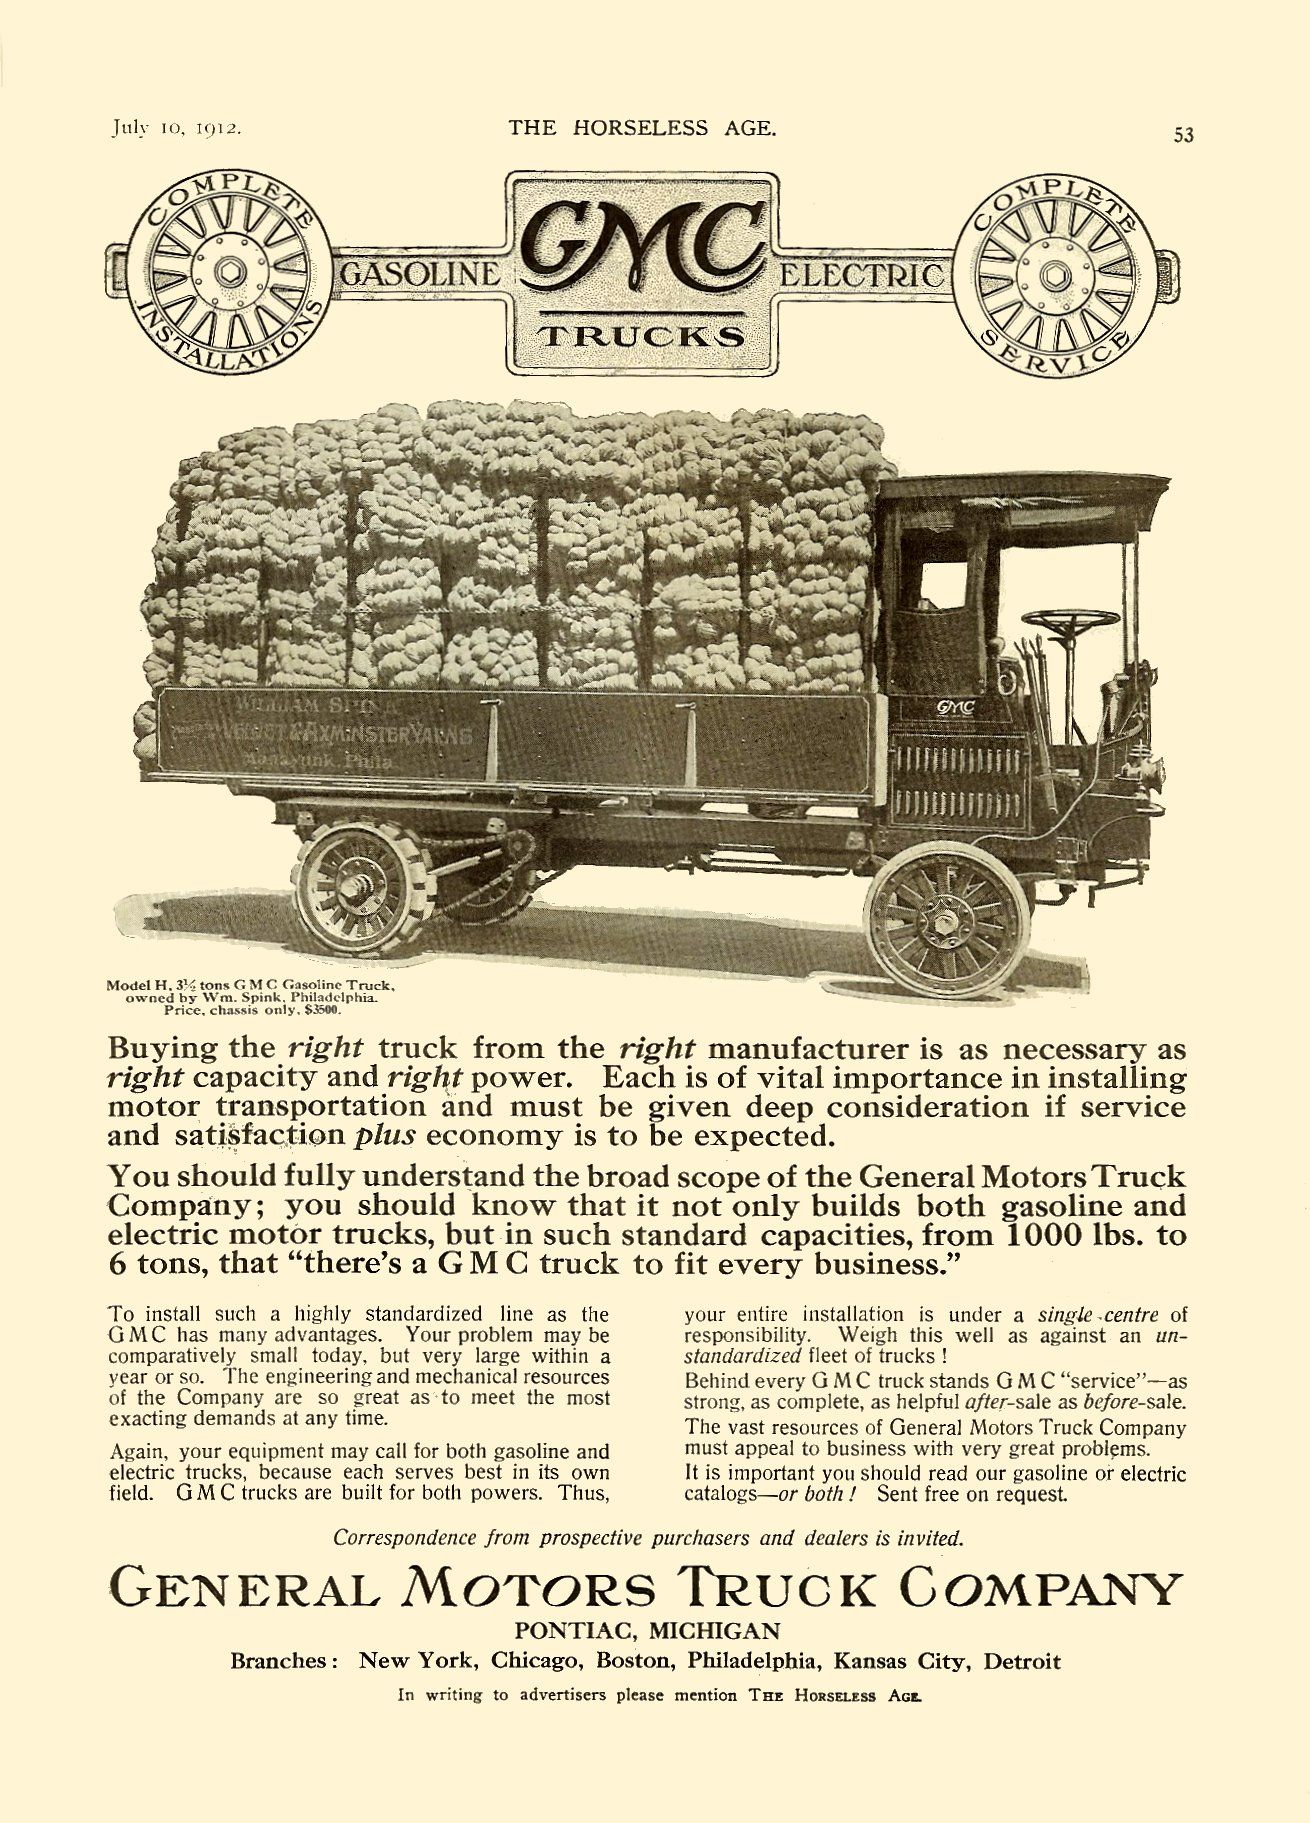 1912 Gasoline Gmc Trucks Electric General Motors Truck Company Pontiac Michigan The Horseless Age Magazine Vol 30 No 2 July 1 Gmc Trucks Trucks Gmc